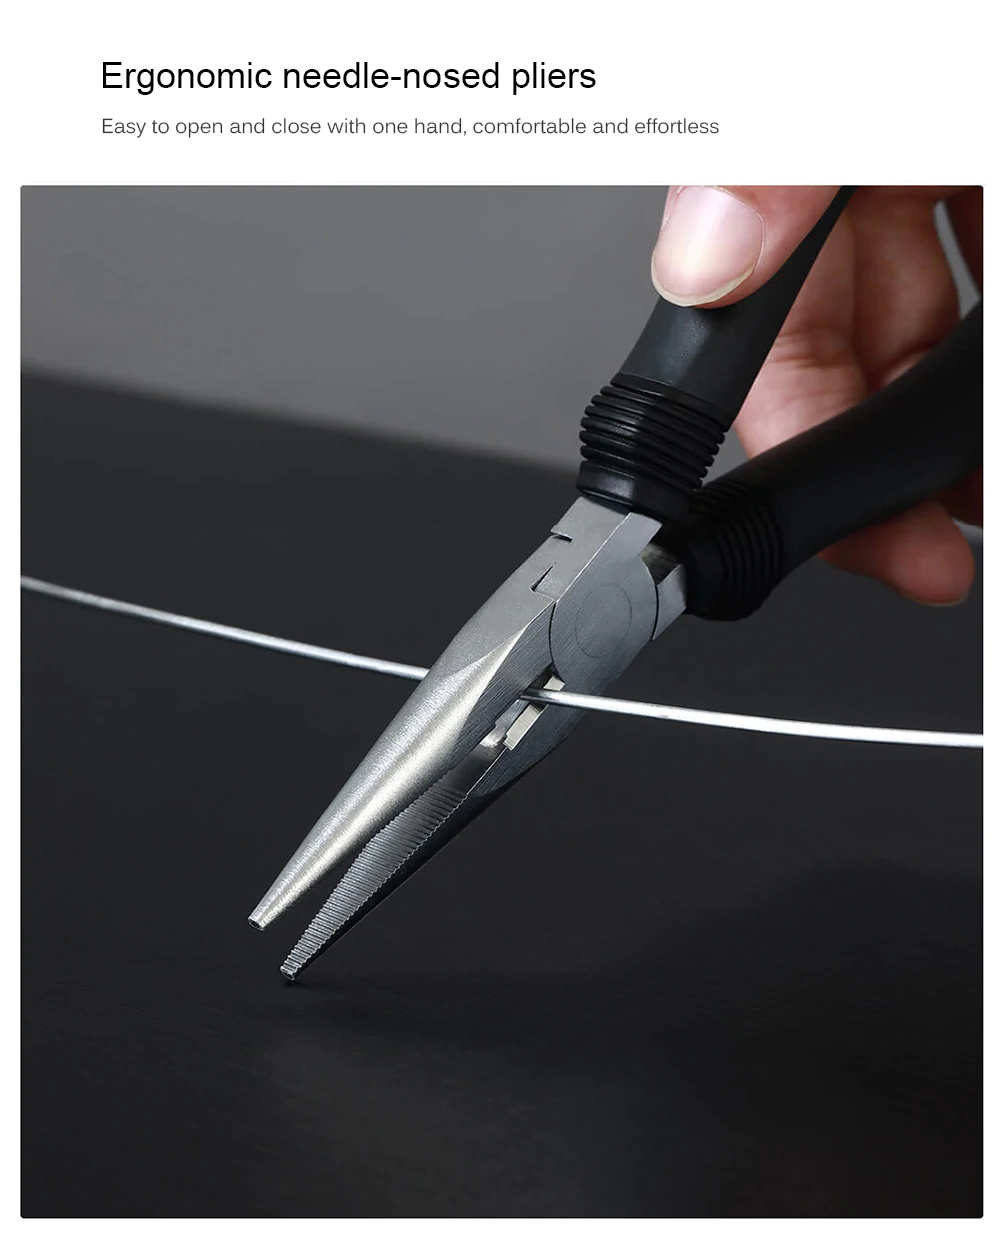 miiiw tool kit